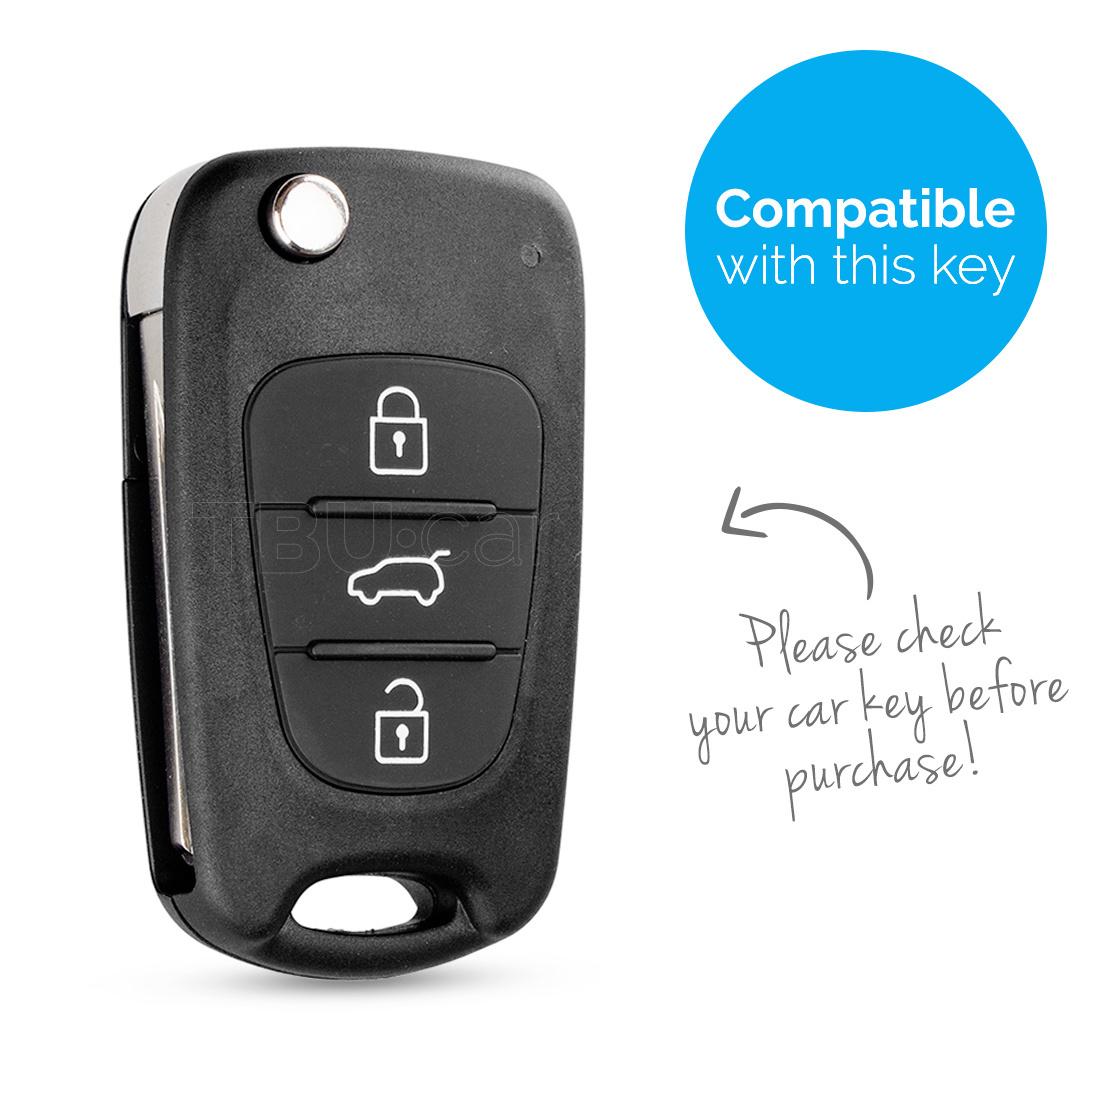 TBU car TBU car Autoschlüssel Hülle kompatibel mit Hyundai 3 Tasten - Schutzhülle aus TPU - Auto Schlüsselhülle Cover in Roségold